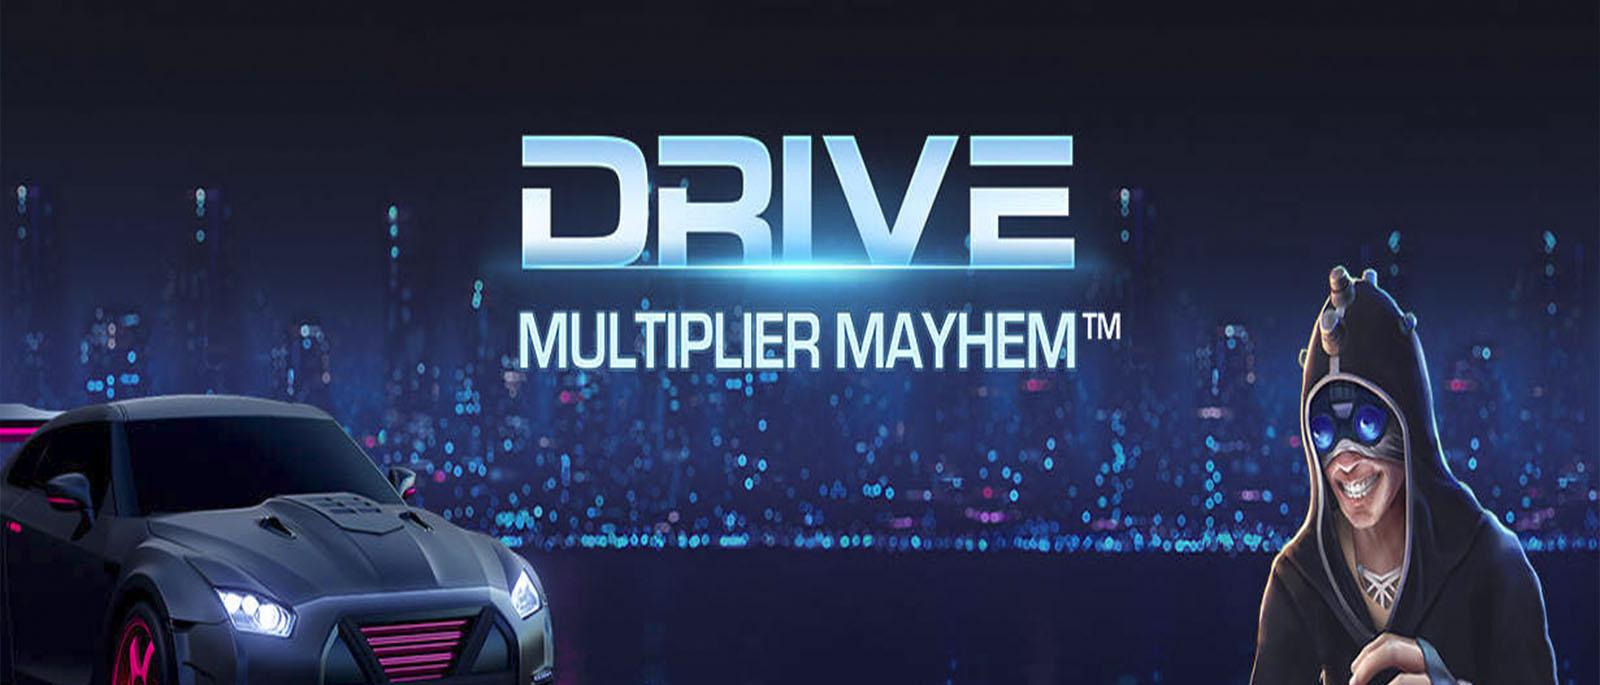 drive multiplier mayhem spielen